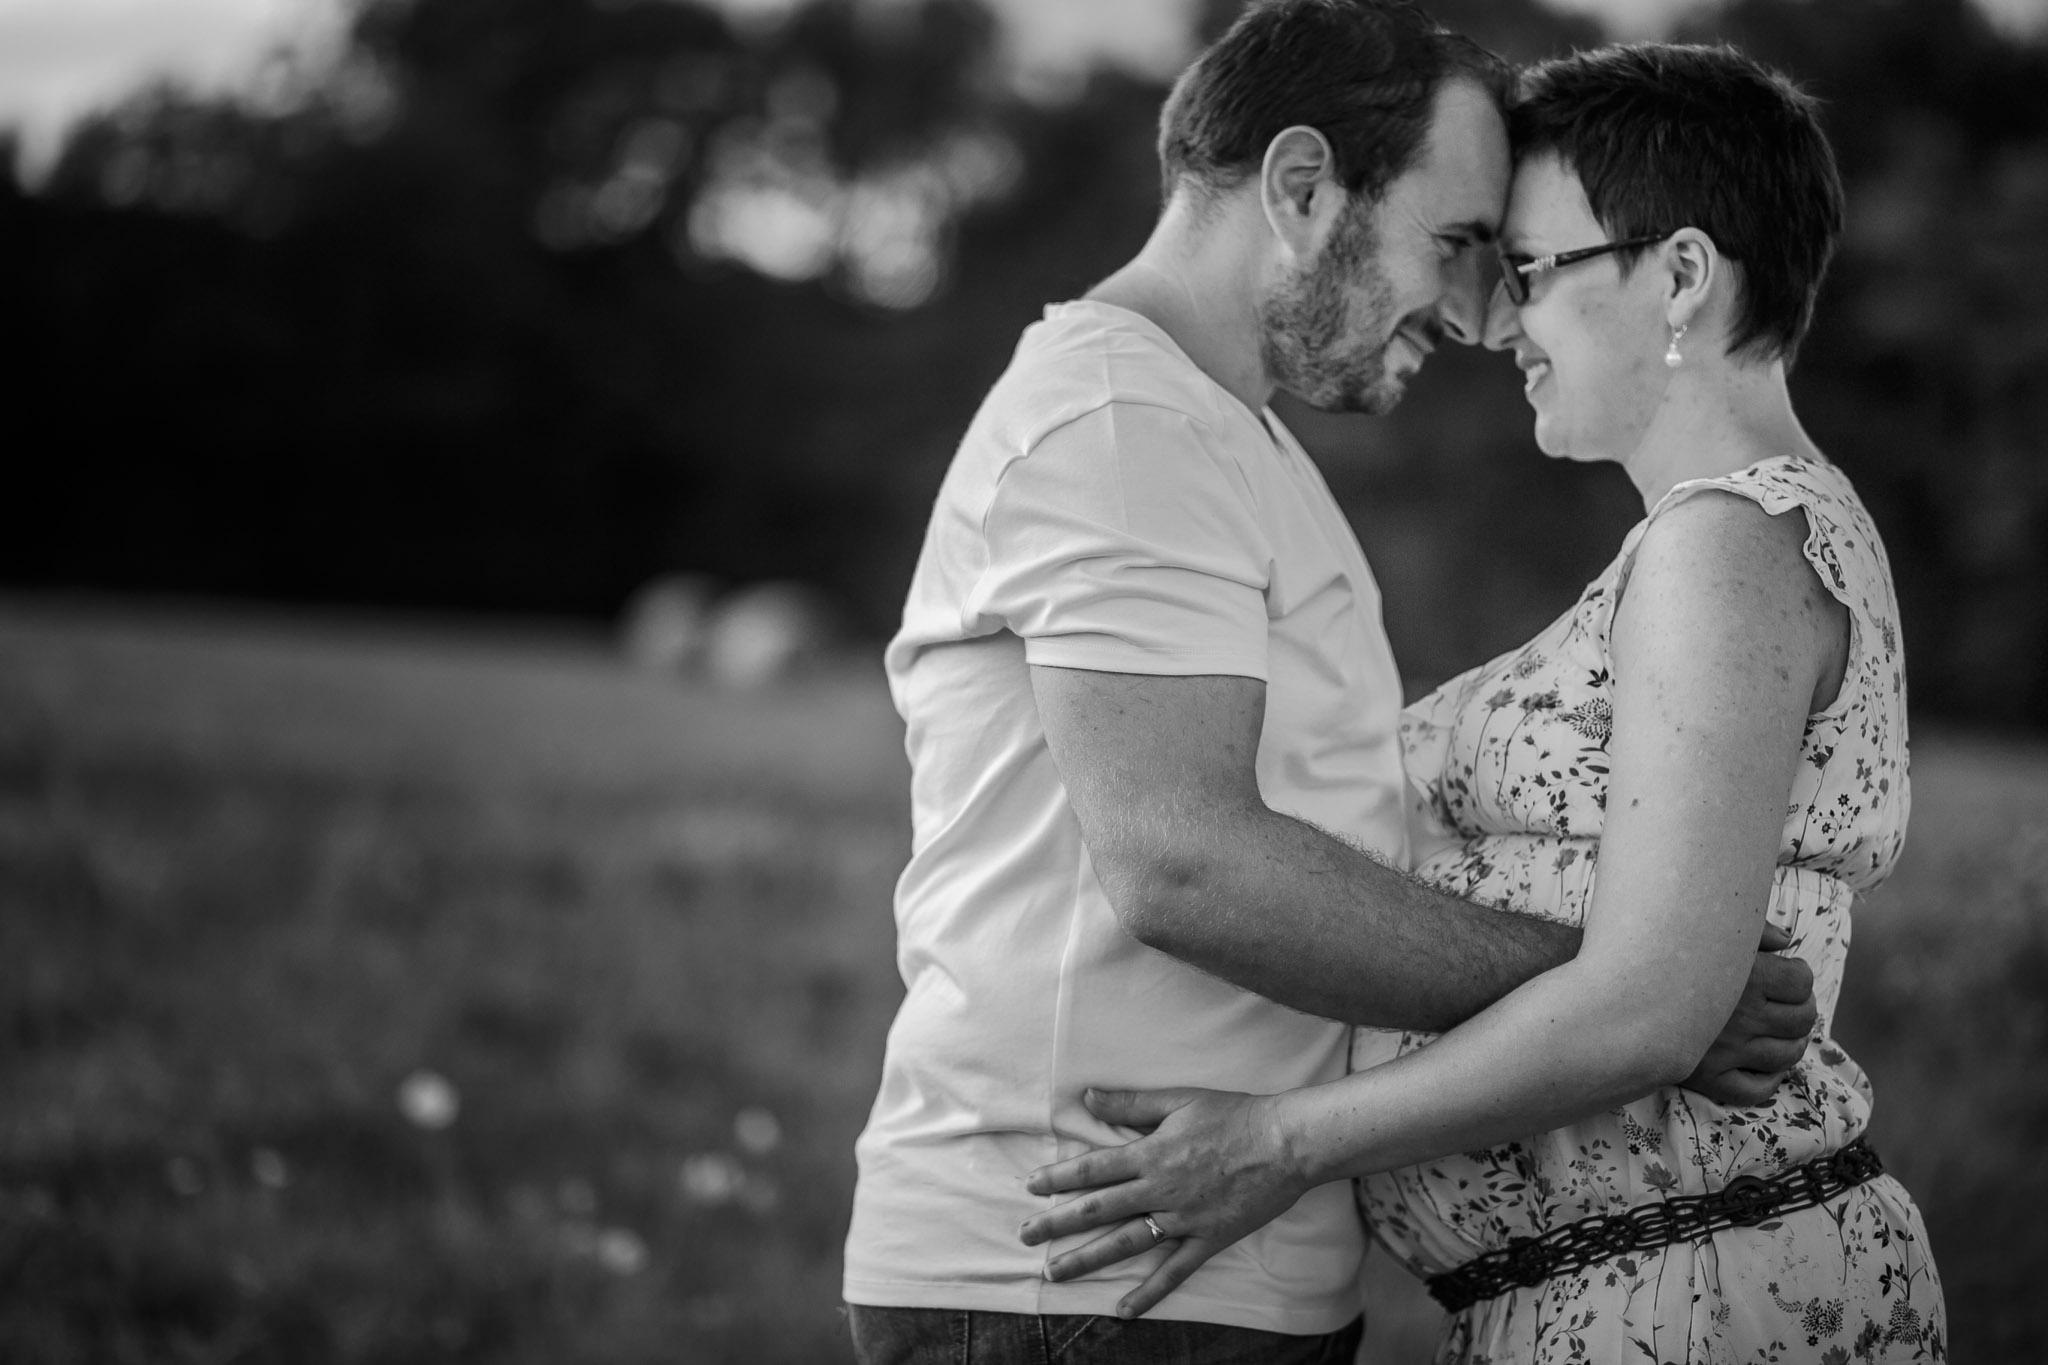 grossesse-femme-enceinte-couple-nature-campagne-ingold-photographe-52.jpg